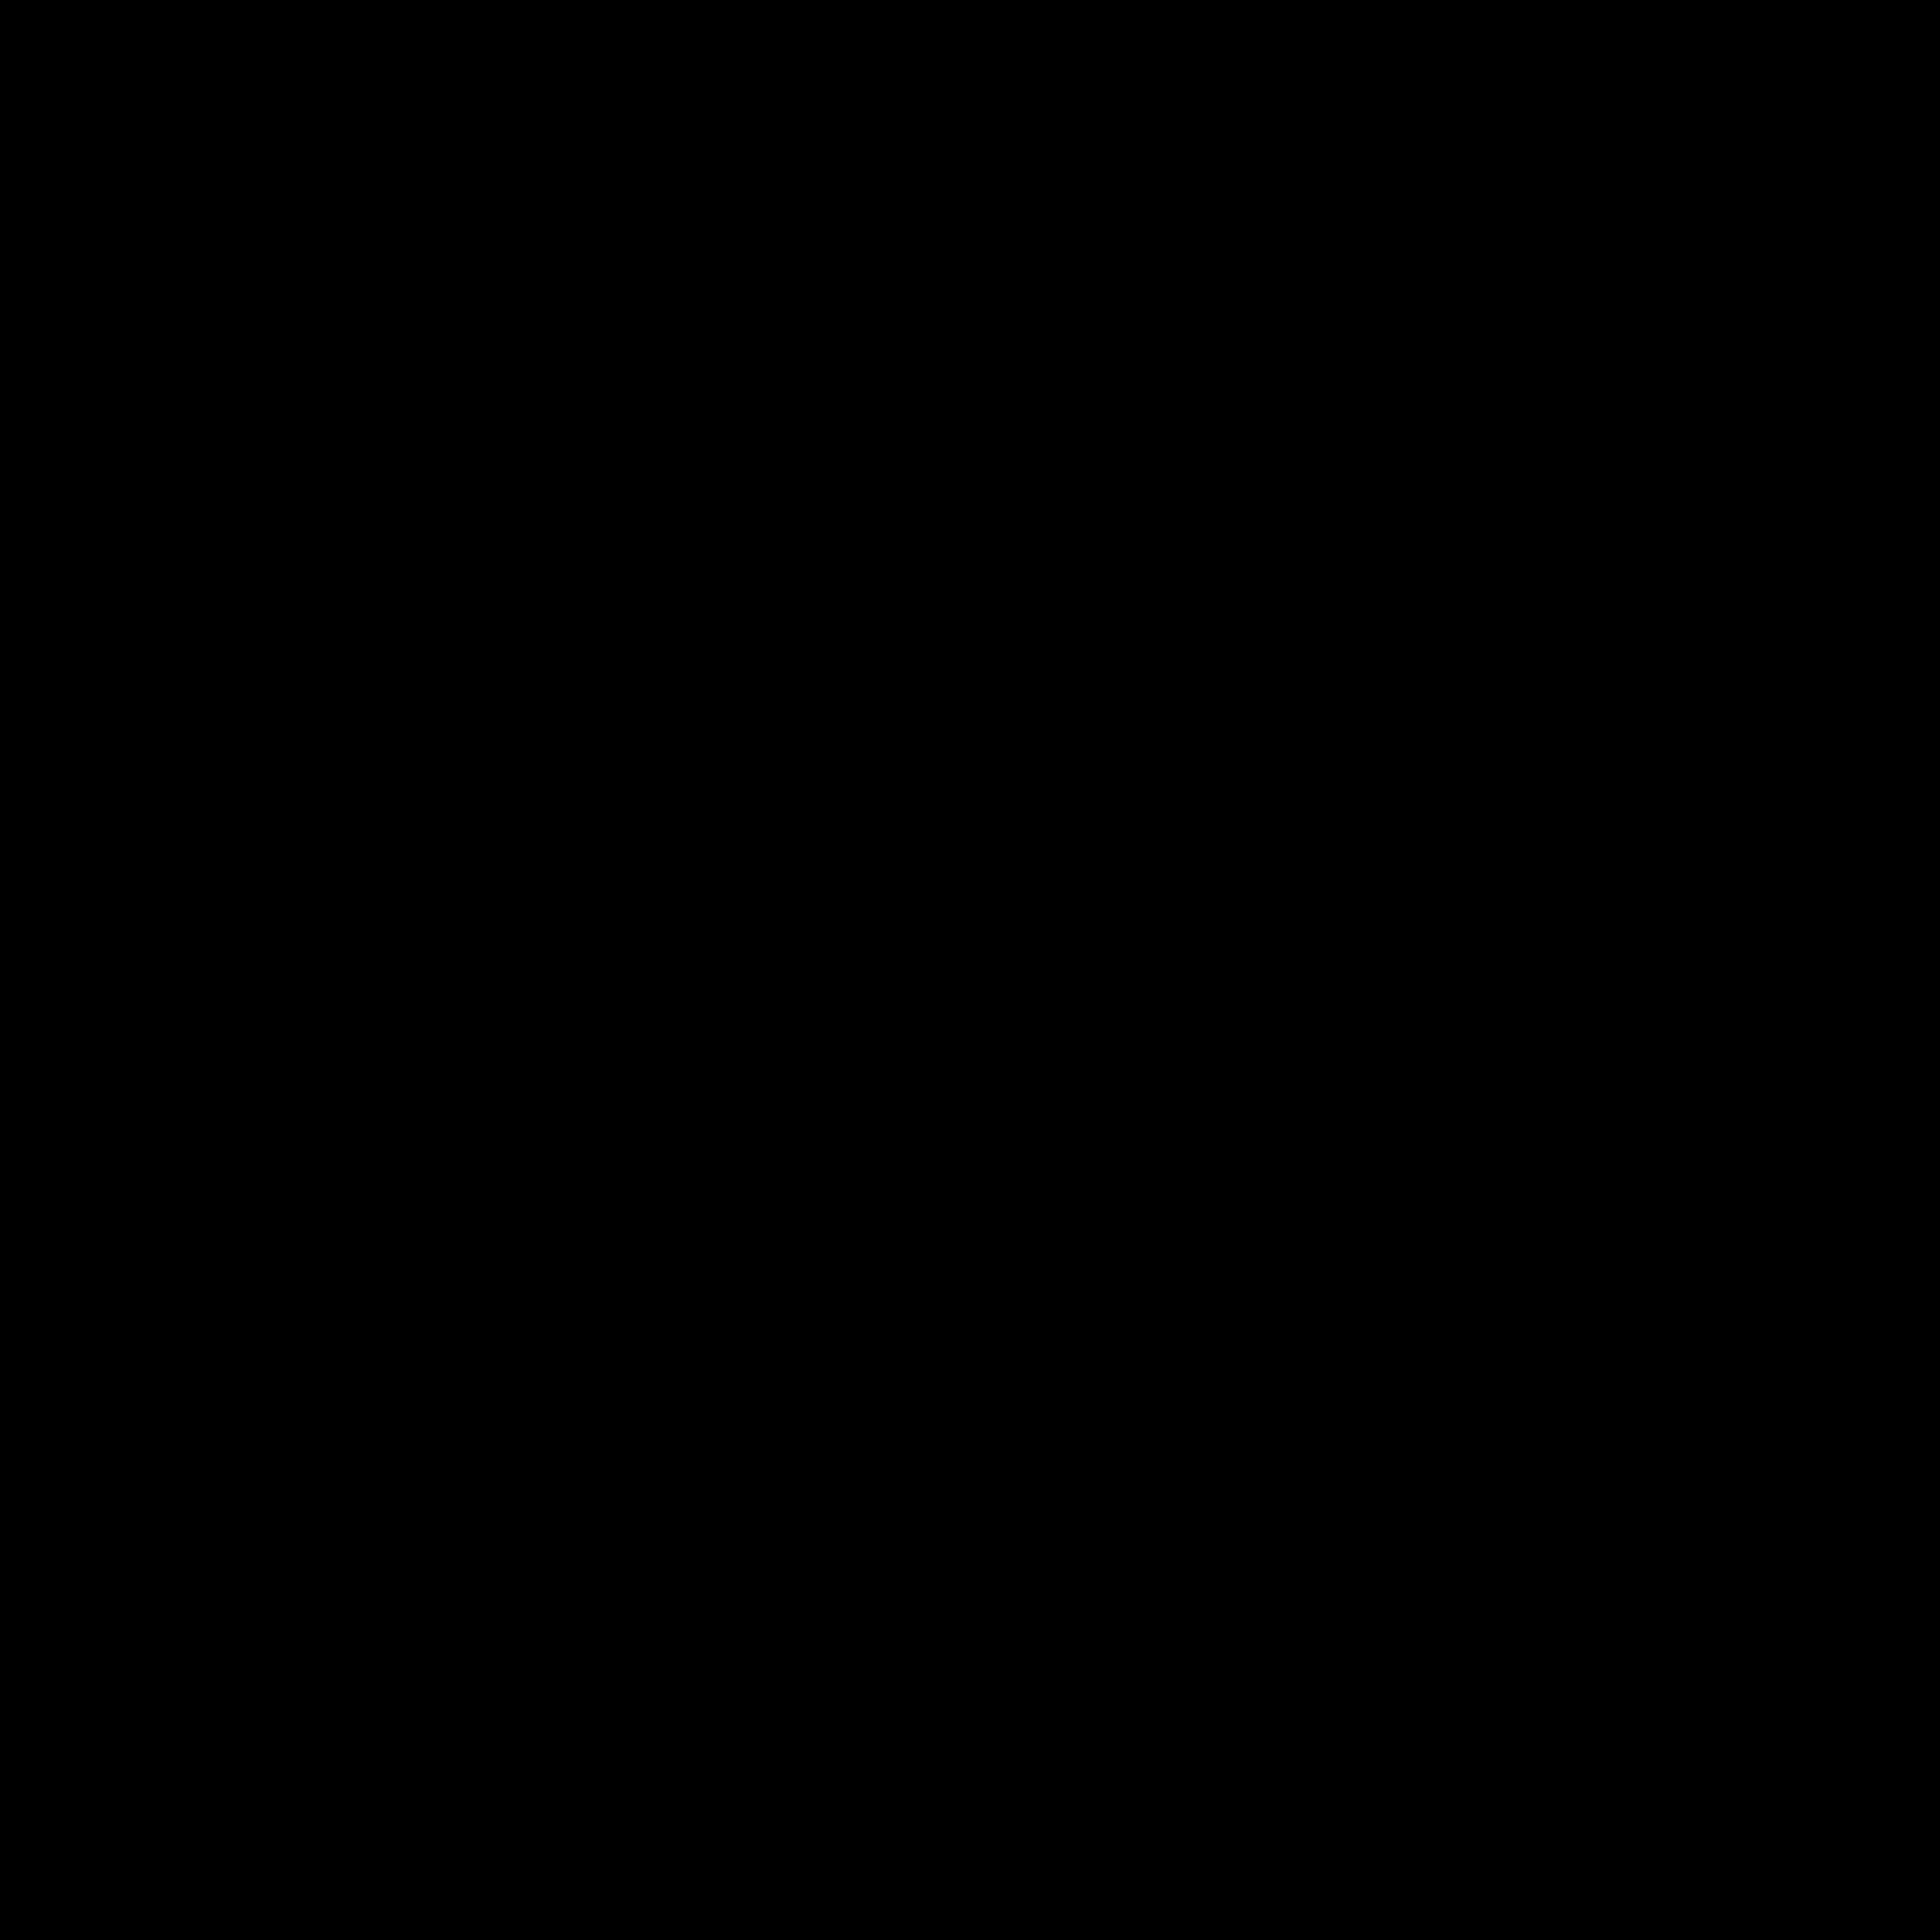 Pace Logo PNG Transparent & SVG Vector.